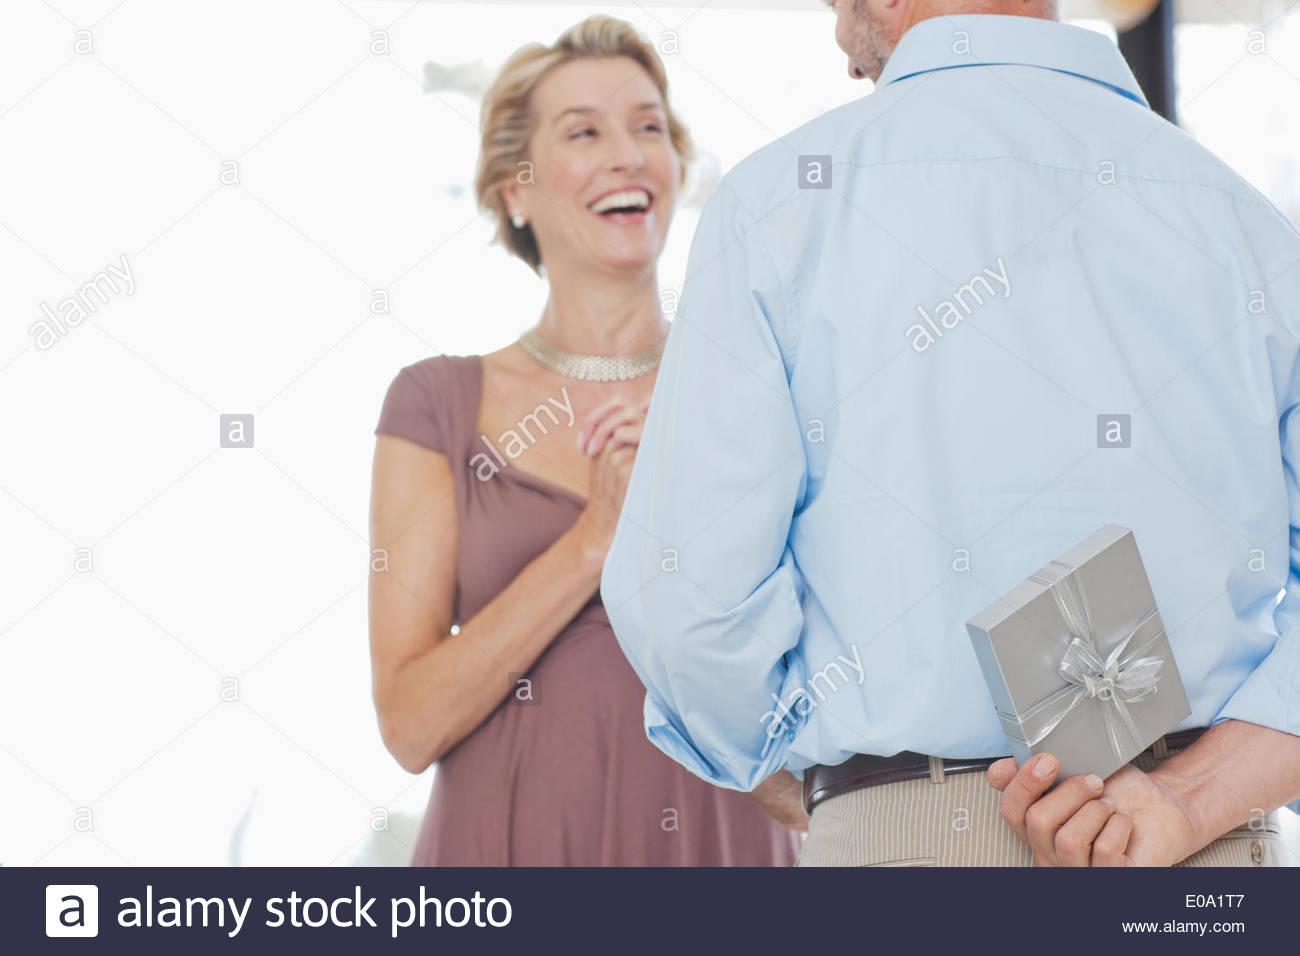 Mann und Frau Jubiläumsgeschenk Stockbild